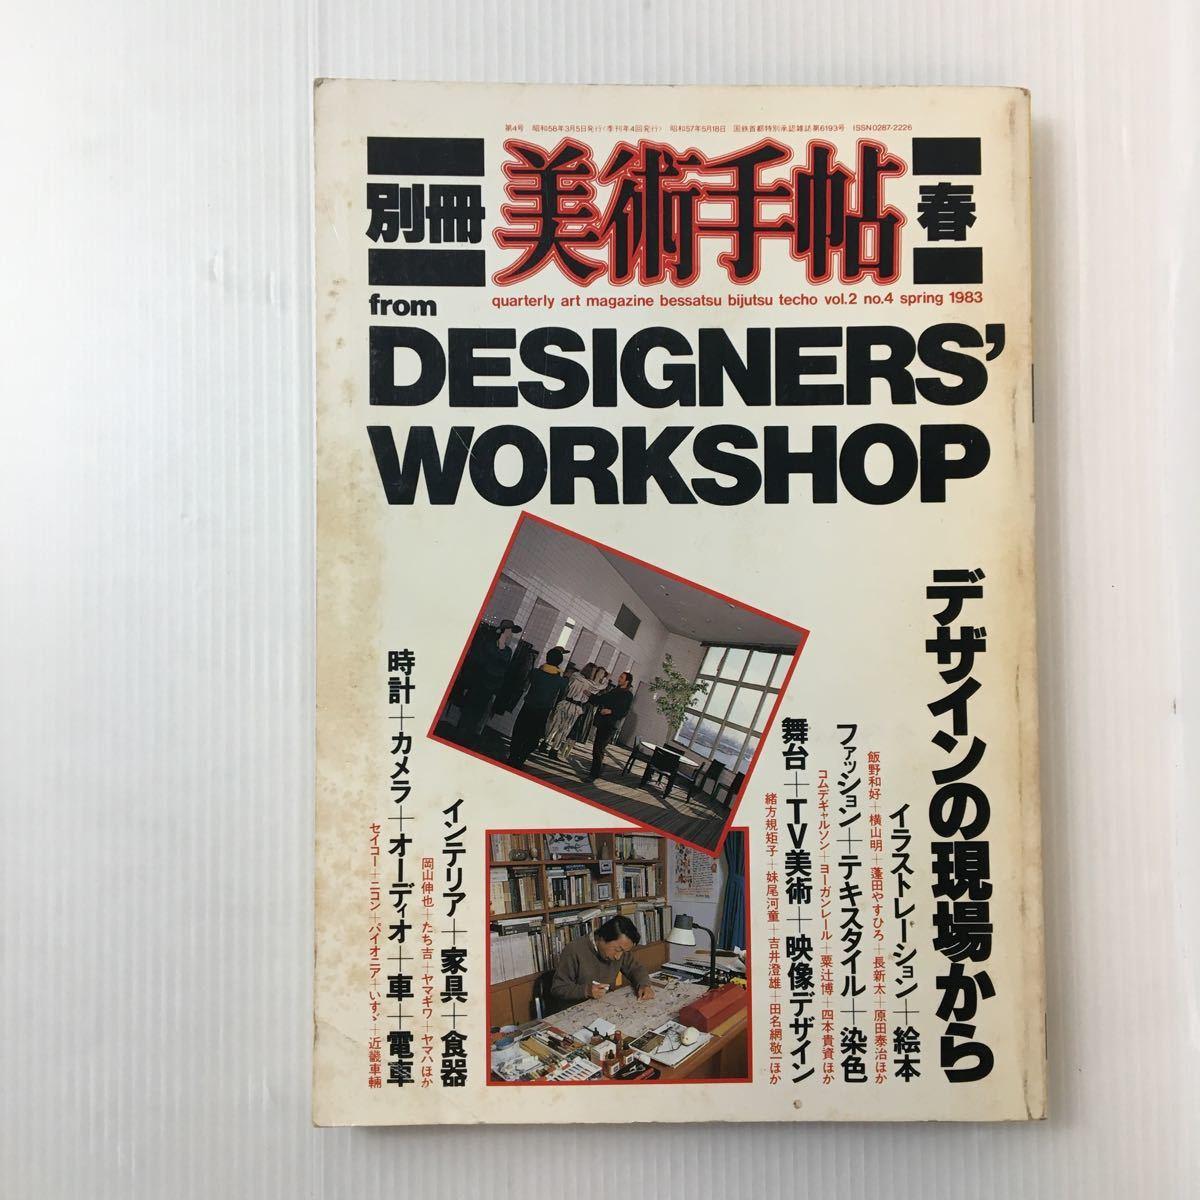 zaa-050♪別冊 美術手帖 デザインの現場から BT美術手帖 1983年3月号 Vol.2 No.4 spring_画像1